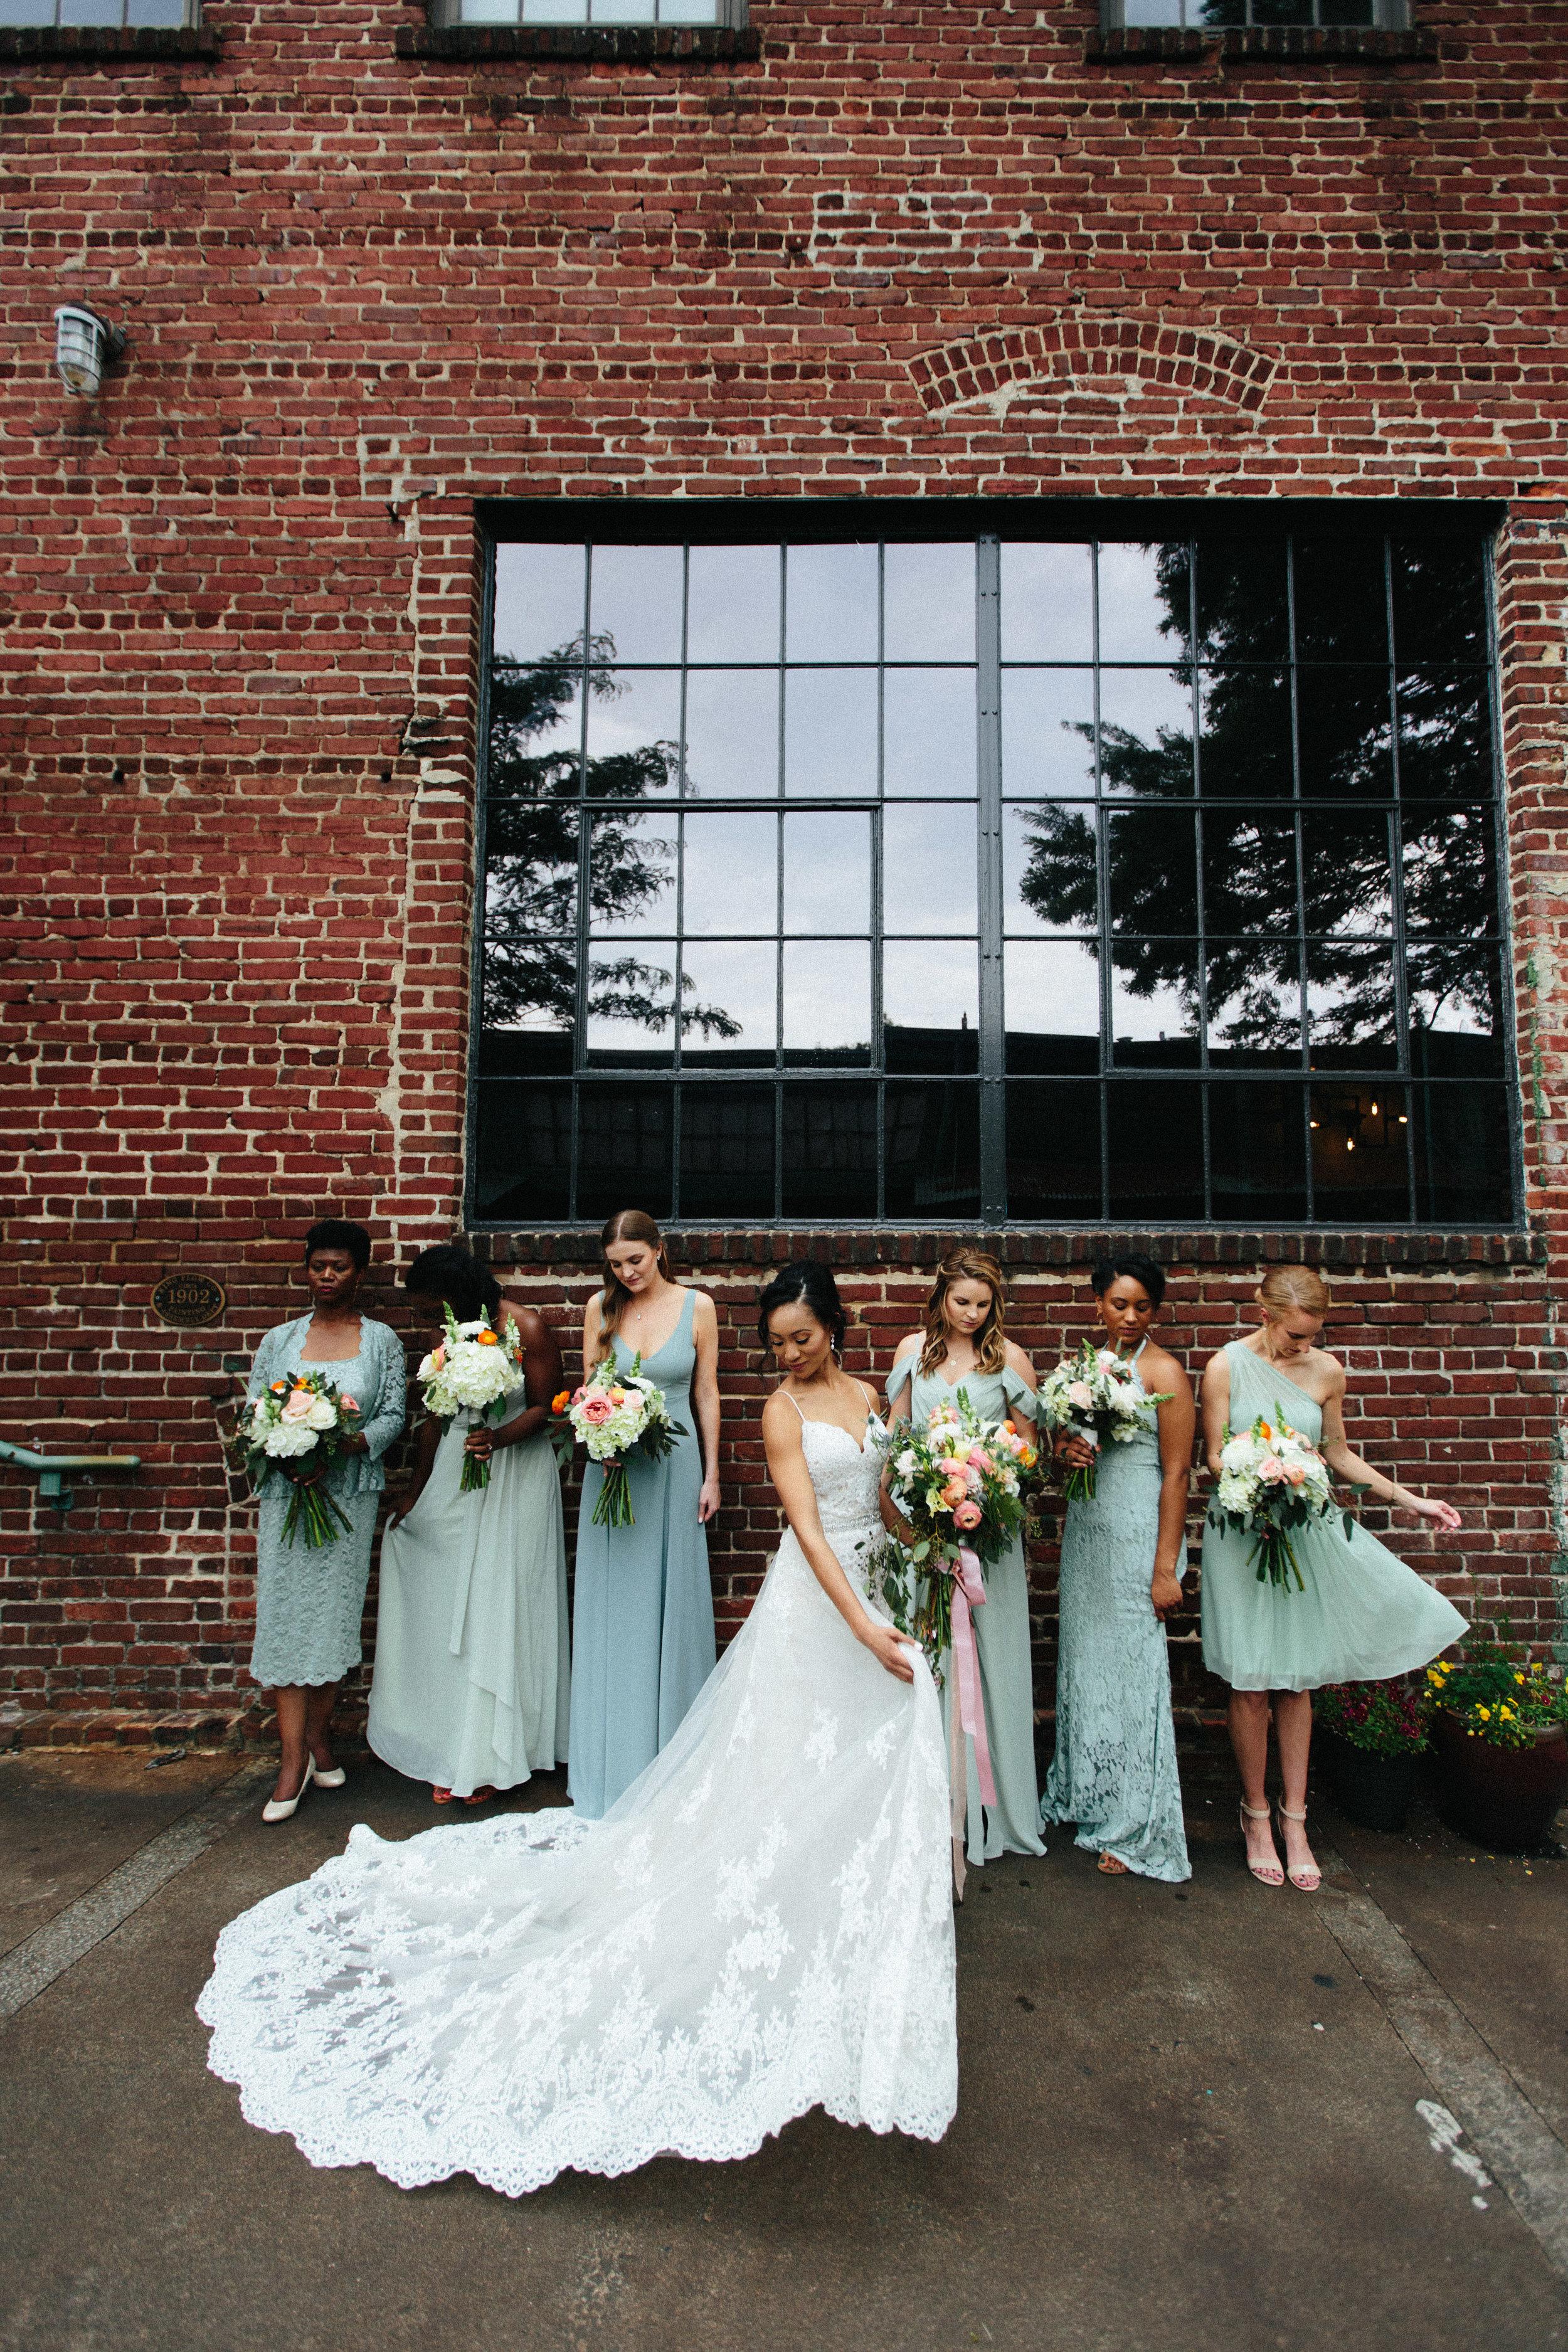 king_plow_atlanta_wedding_art_gallery_modern_lifestyle_documentary_1194.jpg